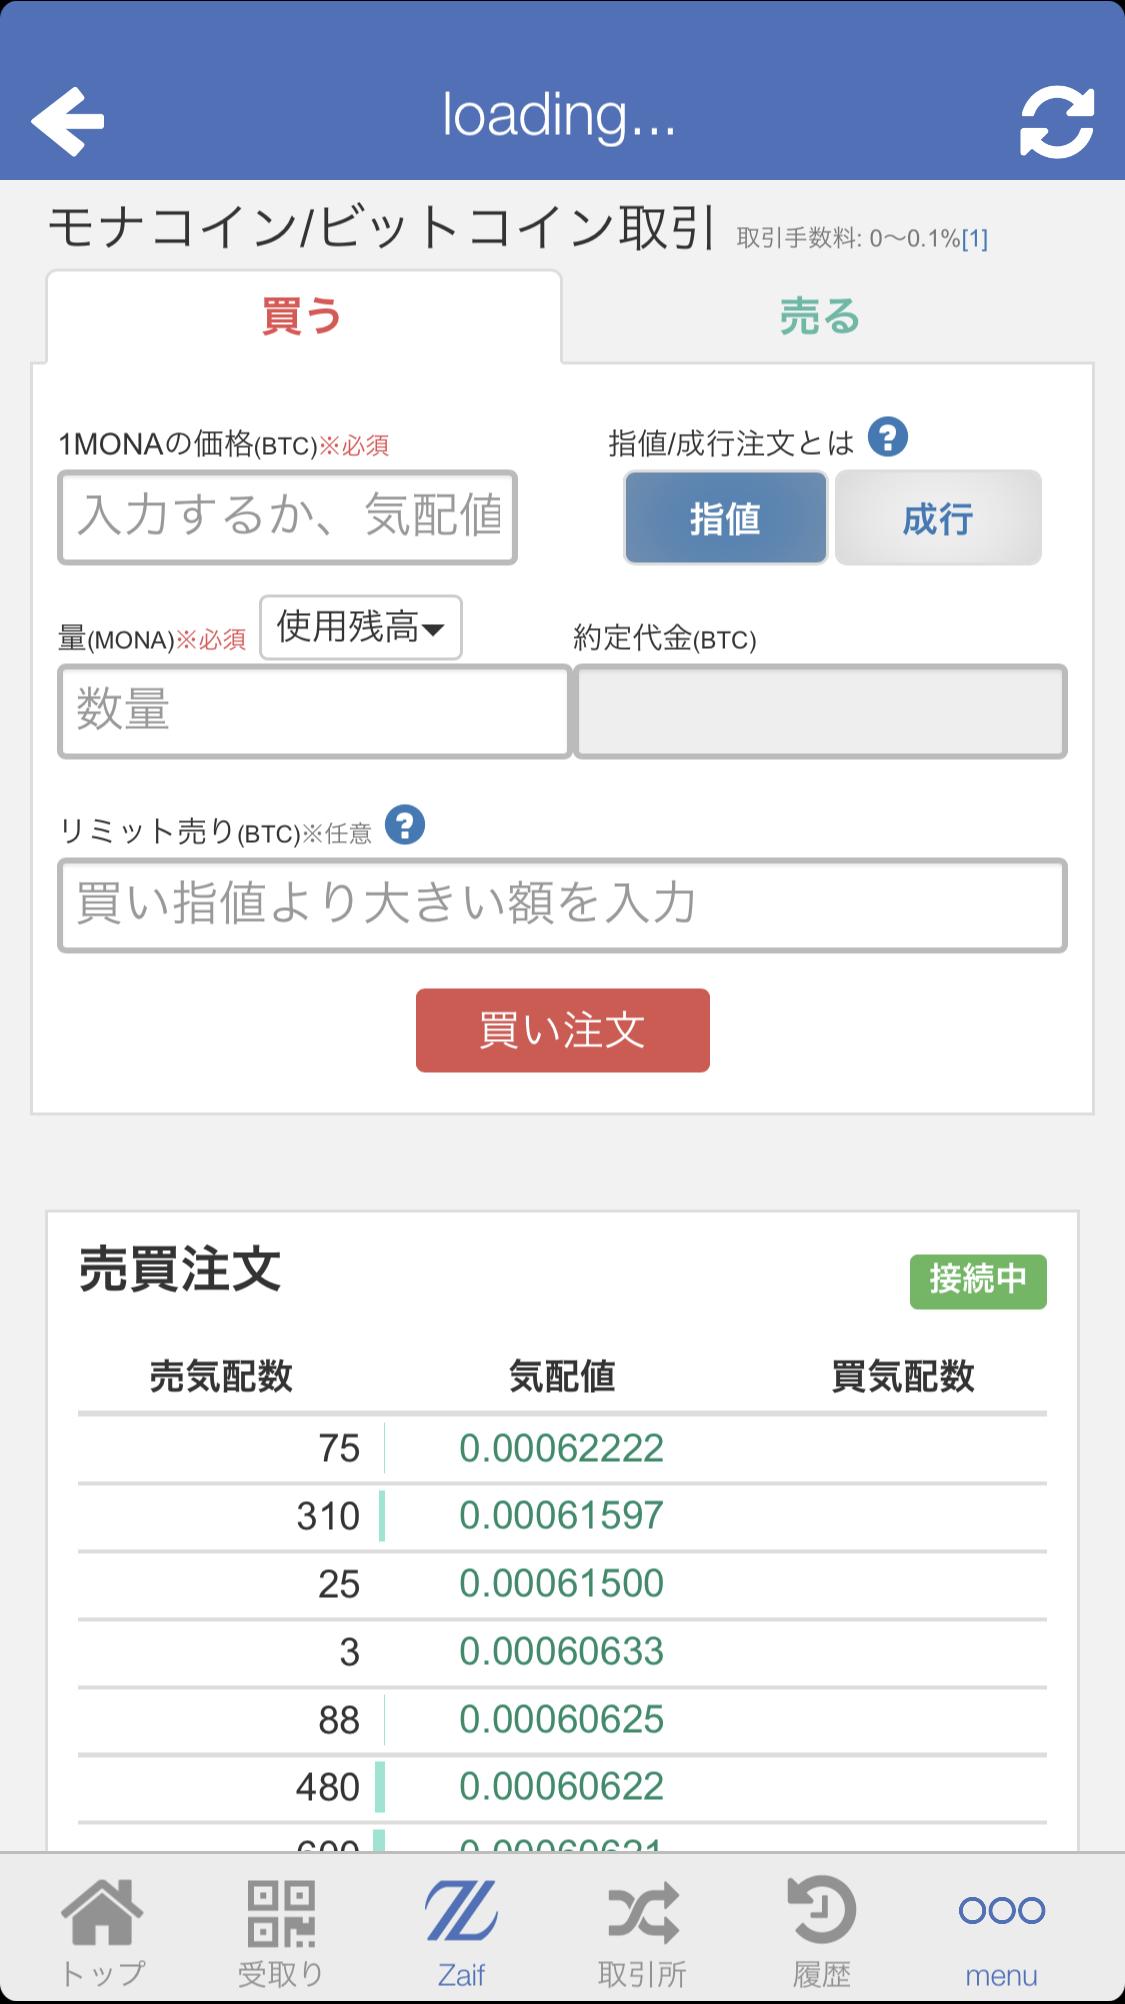 ZaifのMONA/BTCの注文画面